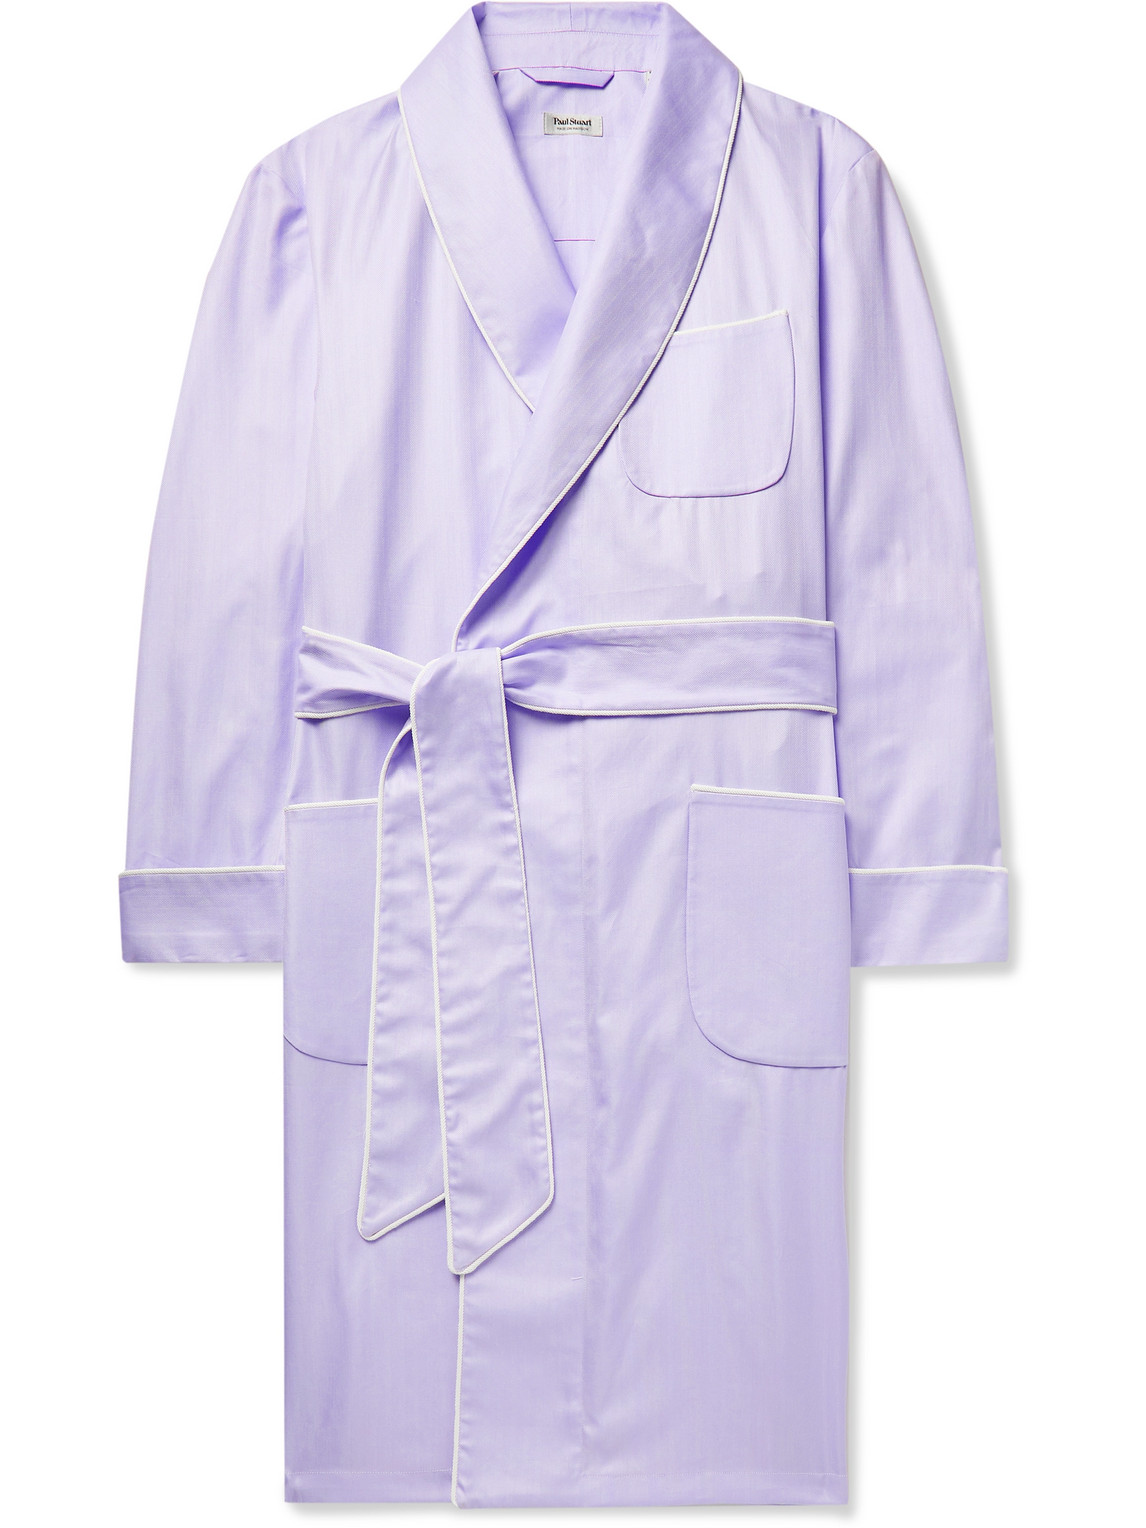 paul stuart - piped herringbone cotton robe - men - purple - m